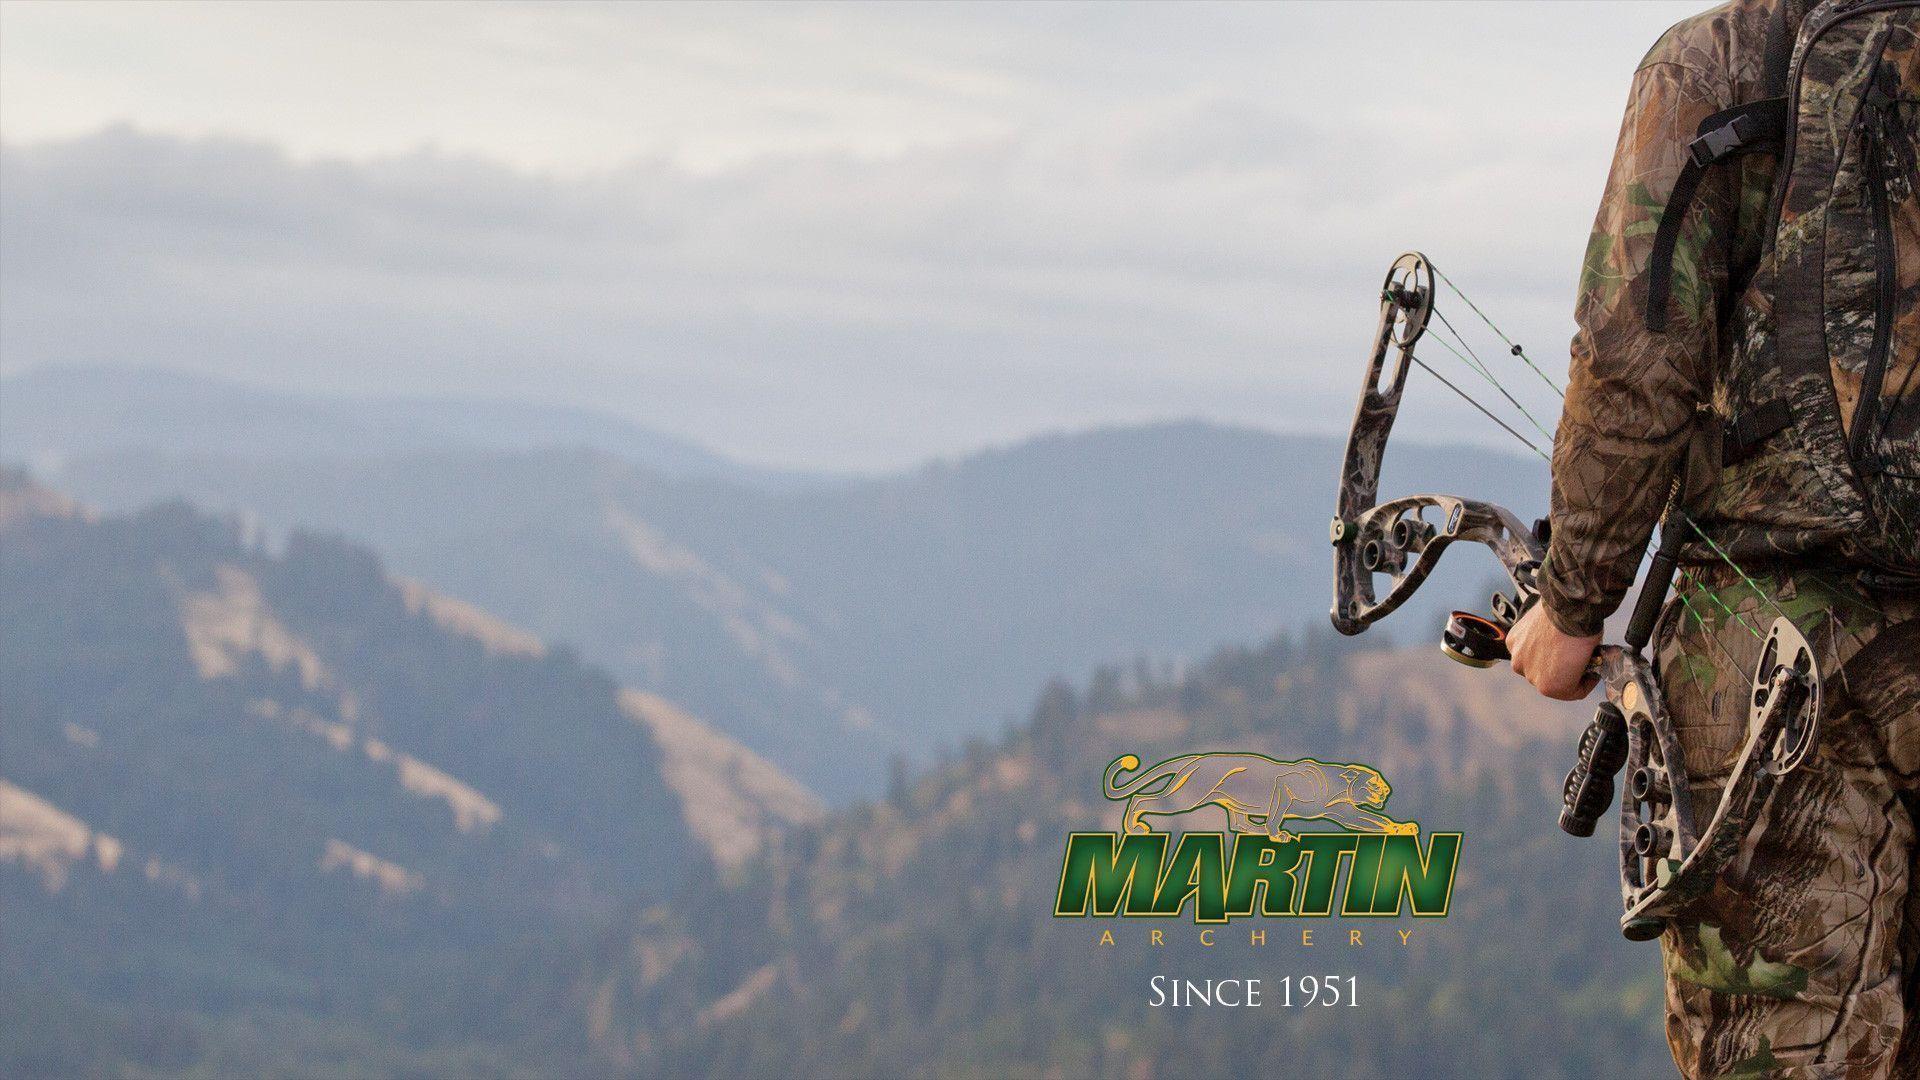 archery wallpaper desktop - photo #6